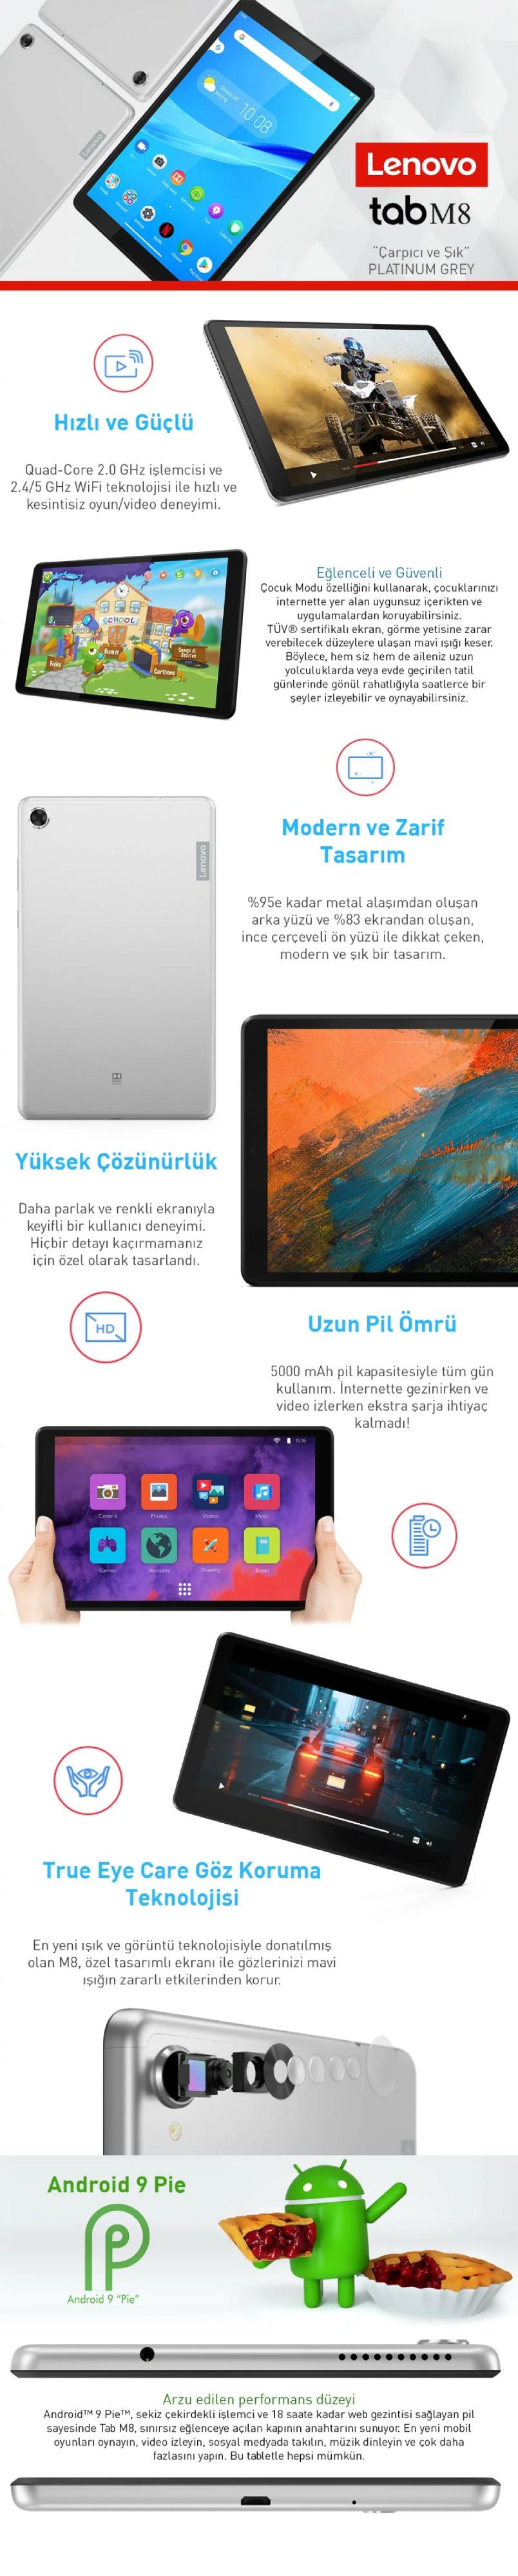 Lenovo Tab M8 ZA5G0100TR TB-8505F 2 GB 32 GB 8 Tablet